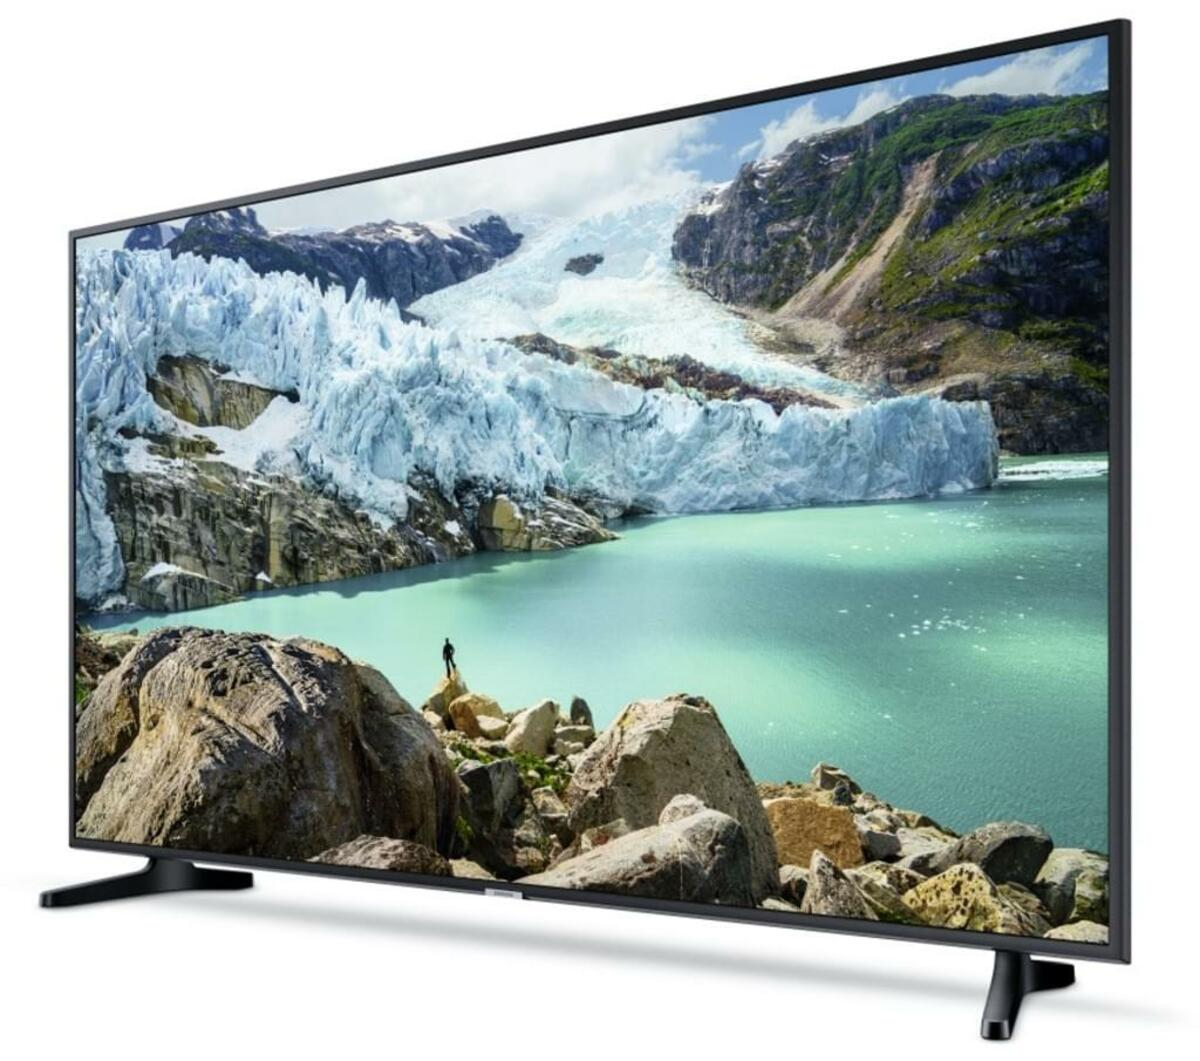 Bild 2 von Samsung 4K Ultra HD LED 138 cm (55 Zoll) 55RU7099 Smart TV, Triple Tuner, HDR10+